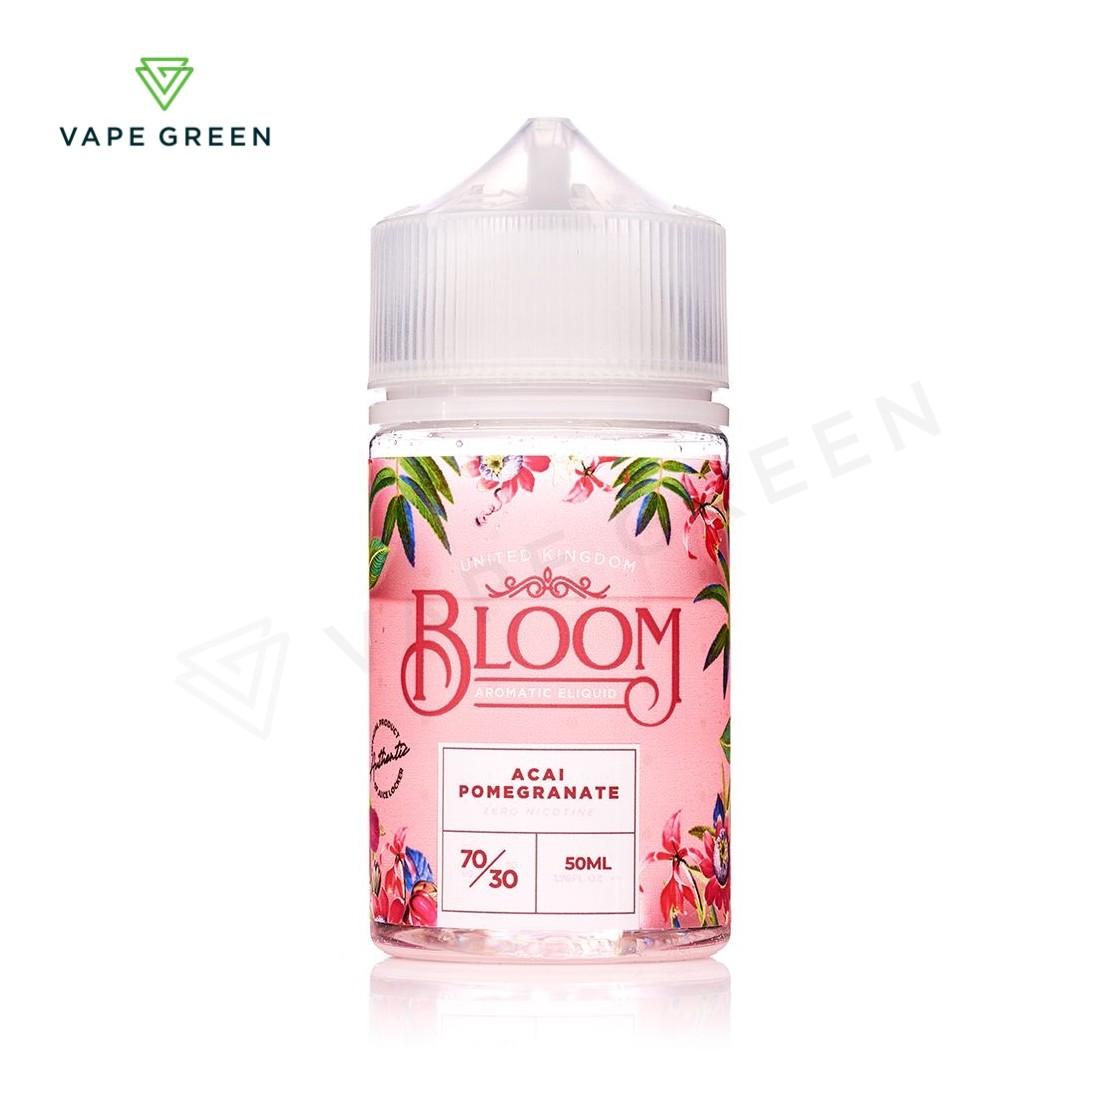 Acai Pomegranate E-Liquid by Bloom 50ml